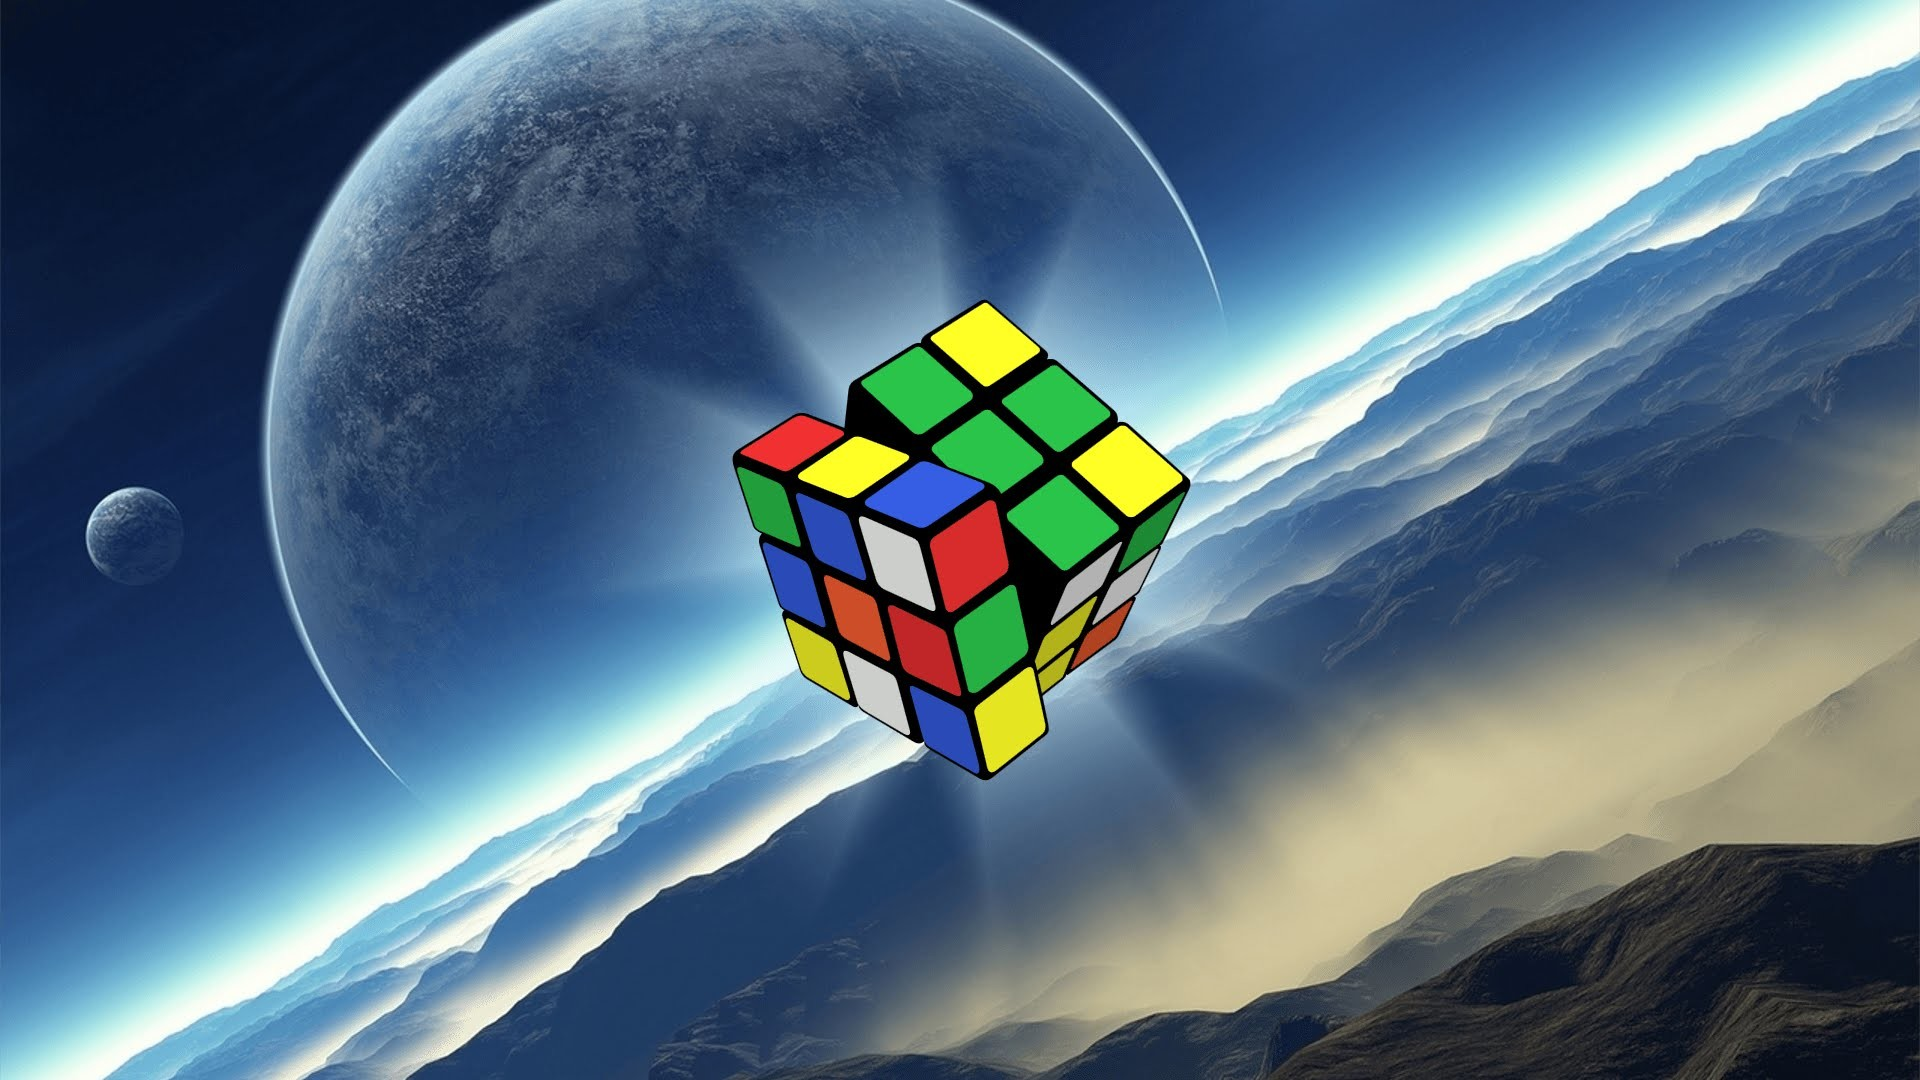 Robot Wall Sticker Rubiks Cube Wallpaper 76 Images